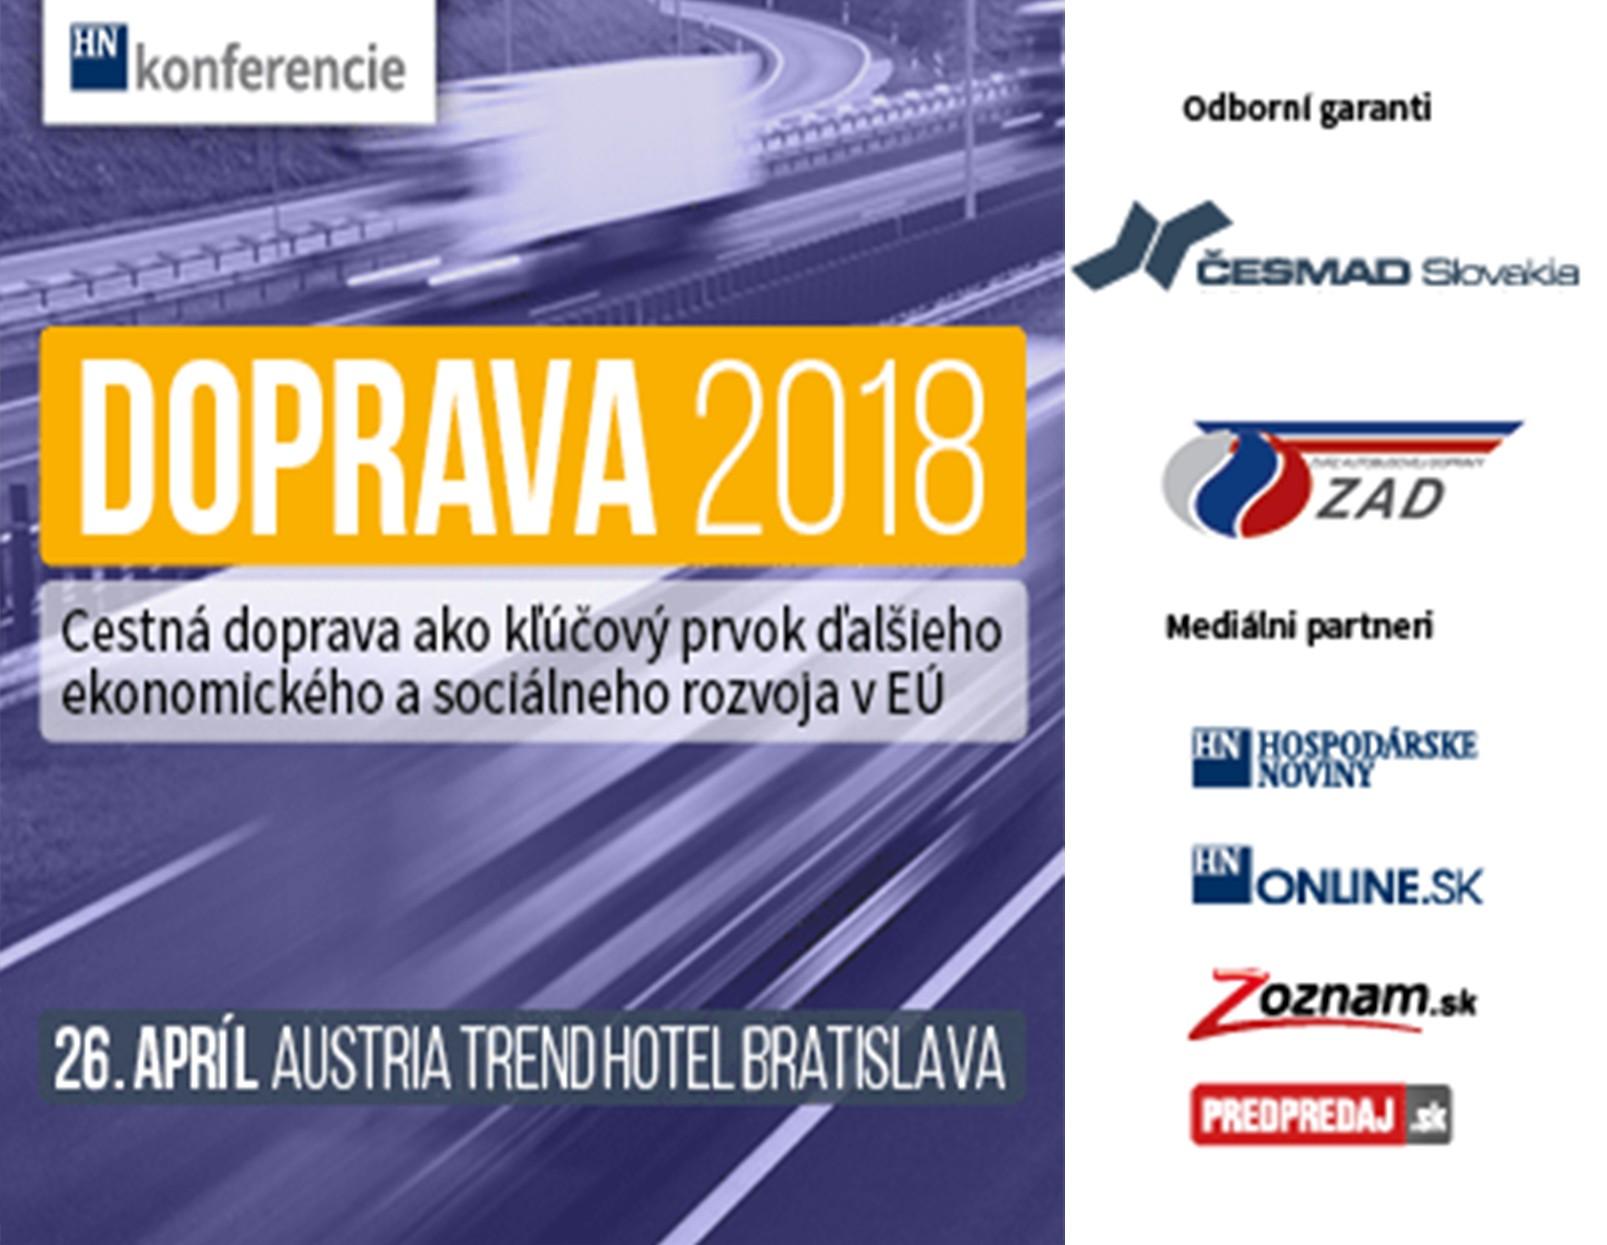 Konferencia DOPRAVA 2018